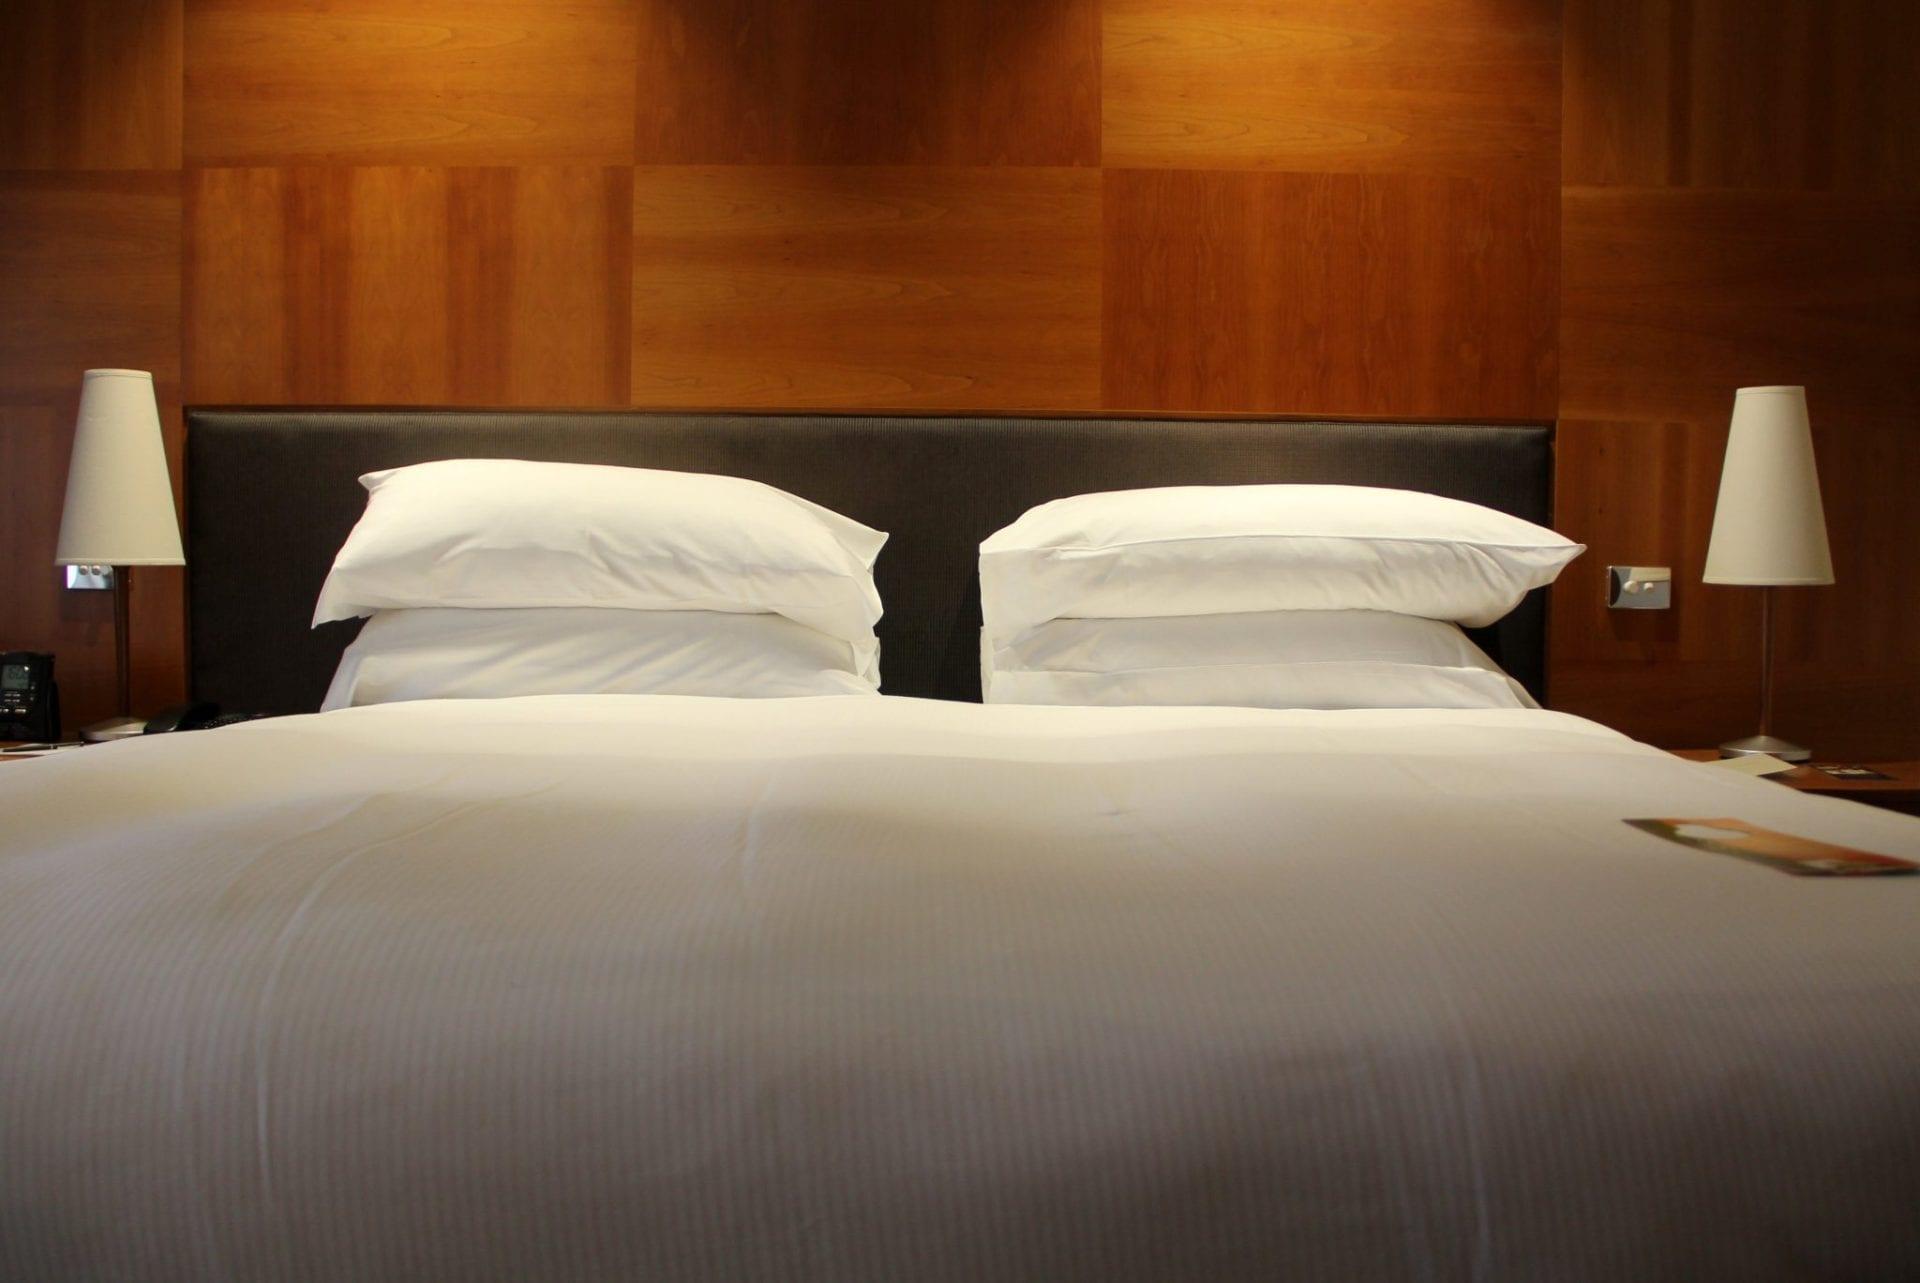 Hilton Adelaide Excecutive Room